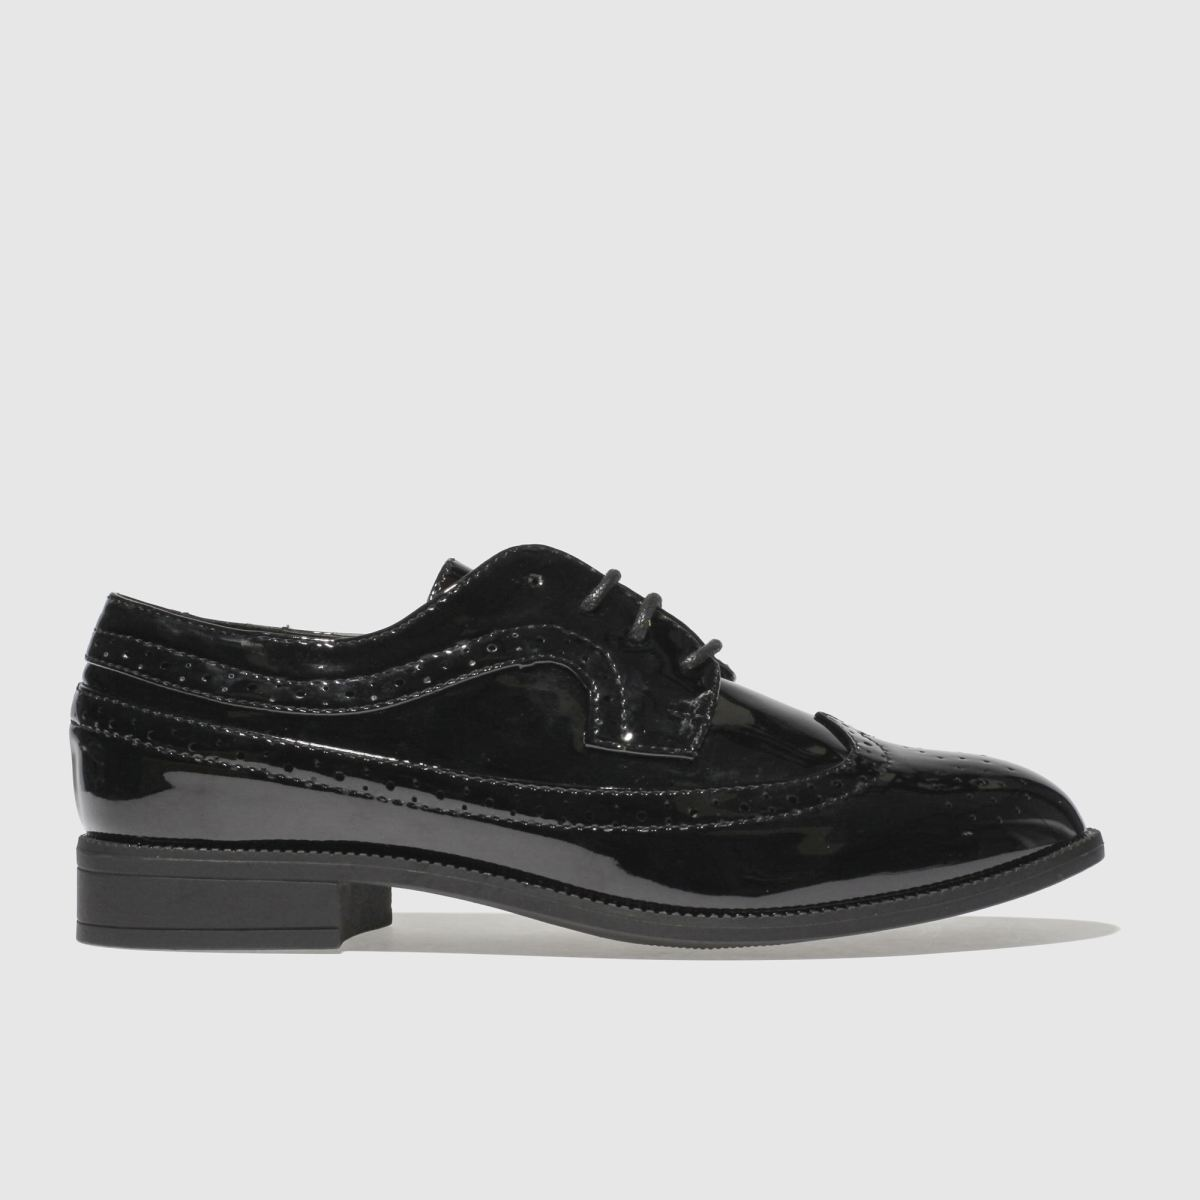 schuh Schuh Black Genius Flat Shoes